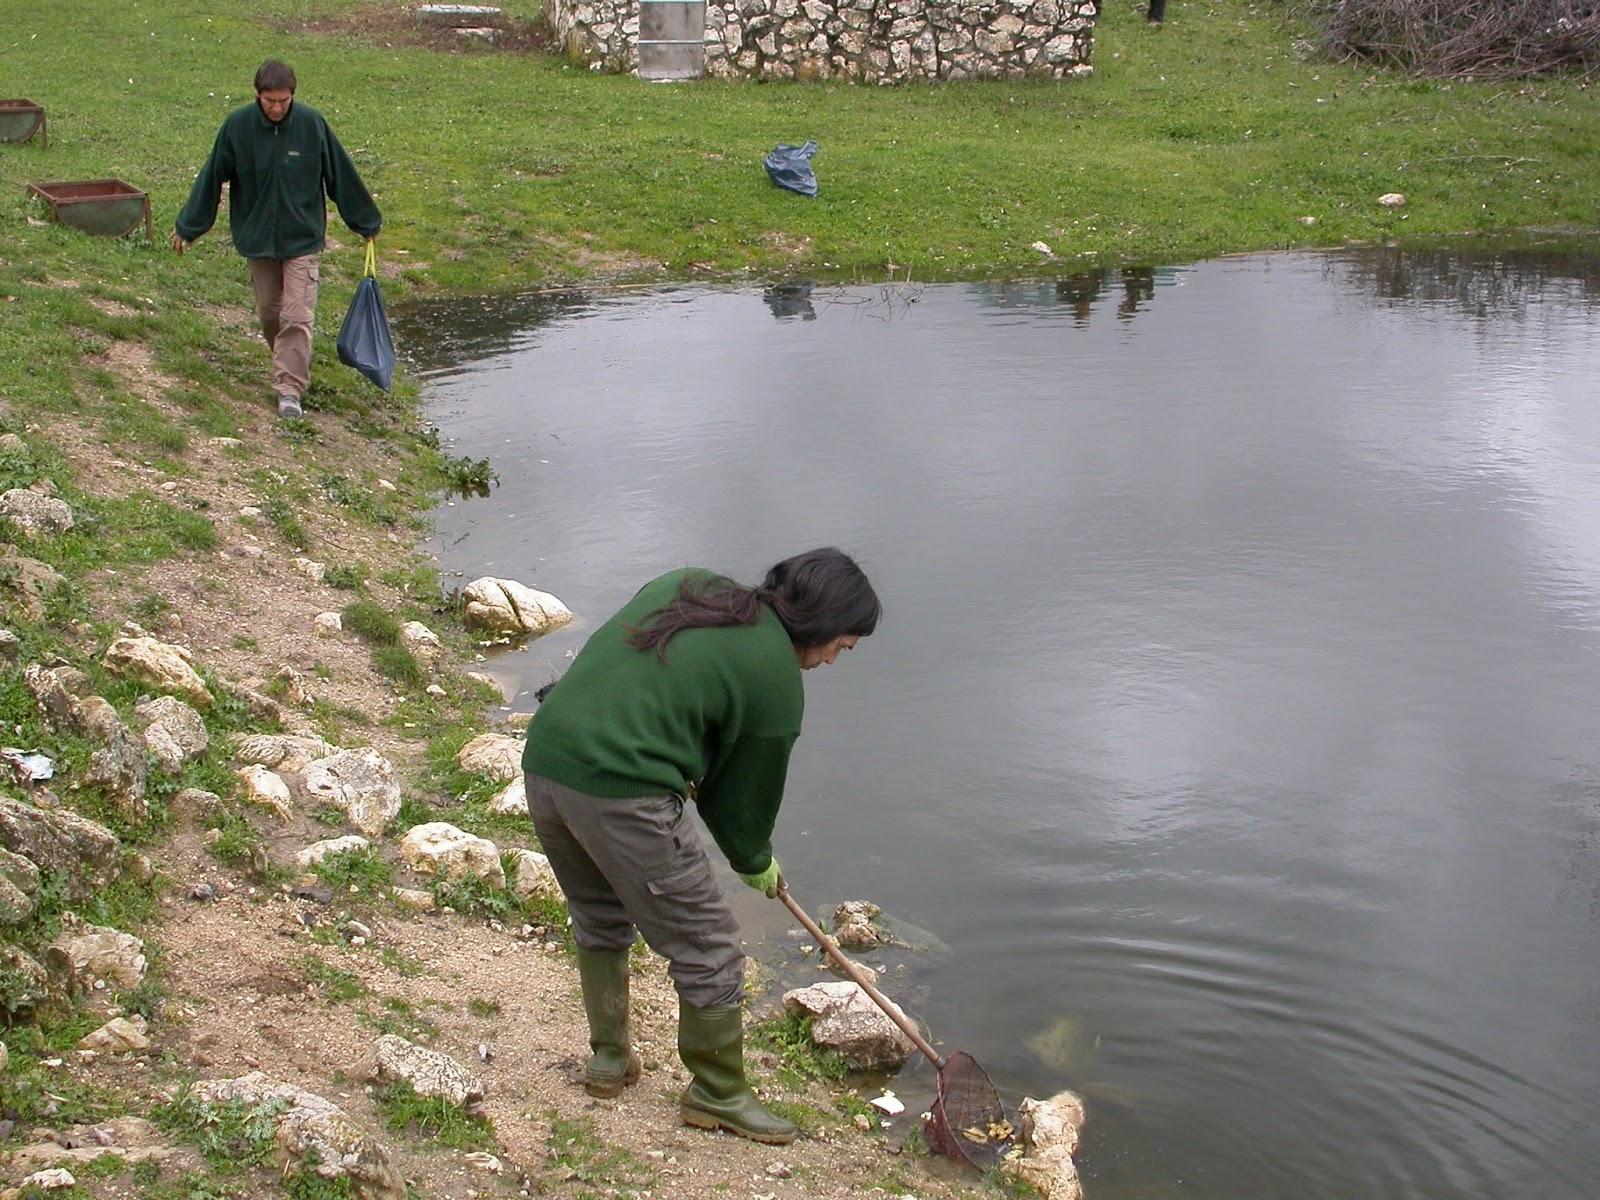 Asociaci n herpetol gica granadina retirando basura en for Plastico para impermeabilizar lagunas